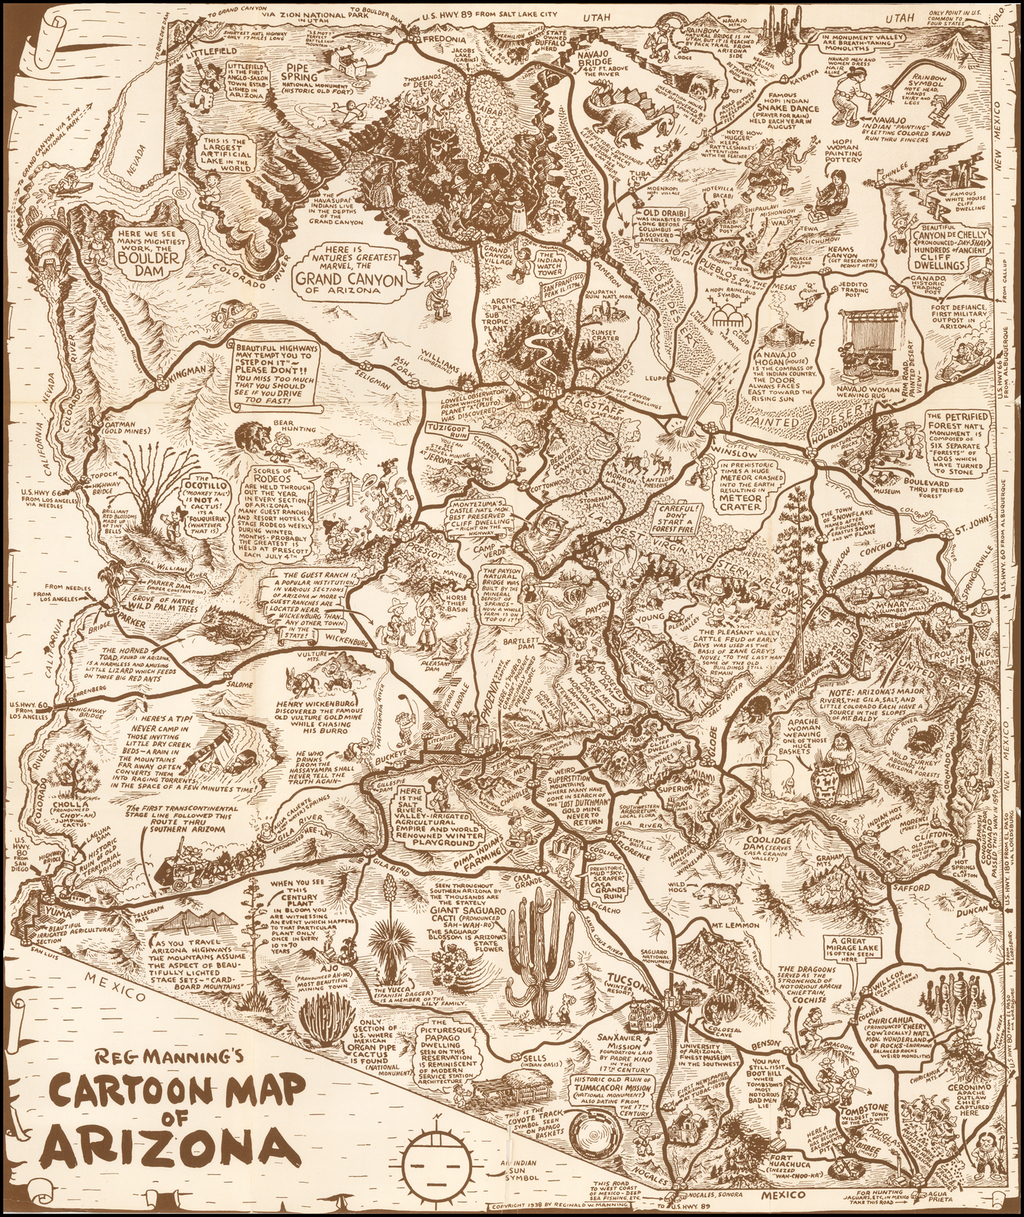 Reg Manning's Cartoon Map of Arizona By Reginald Manning